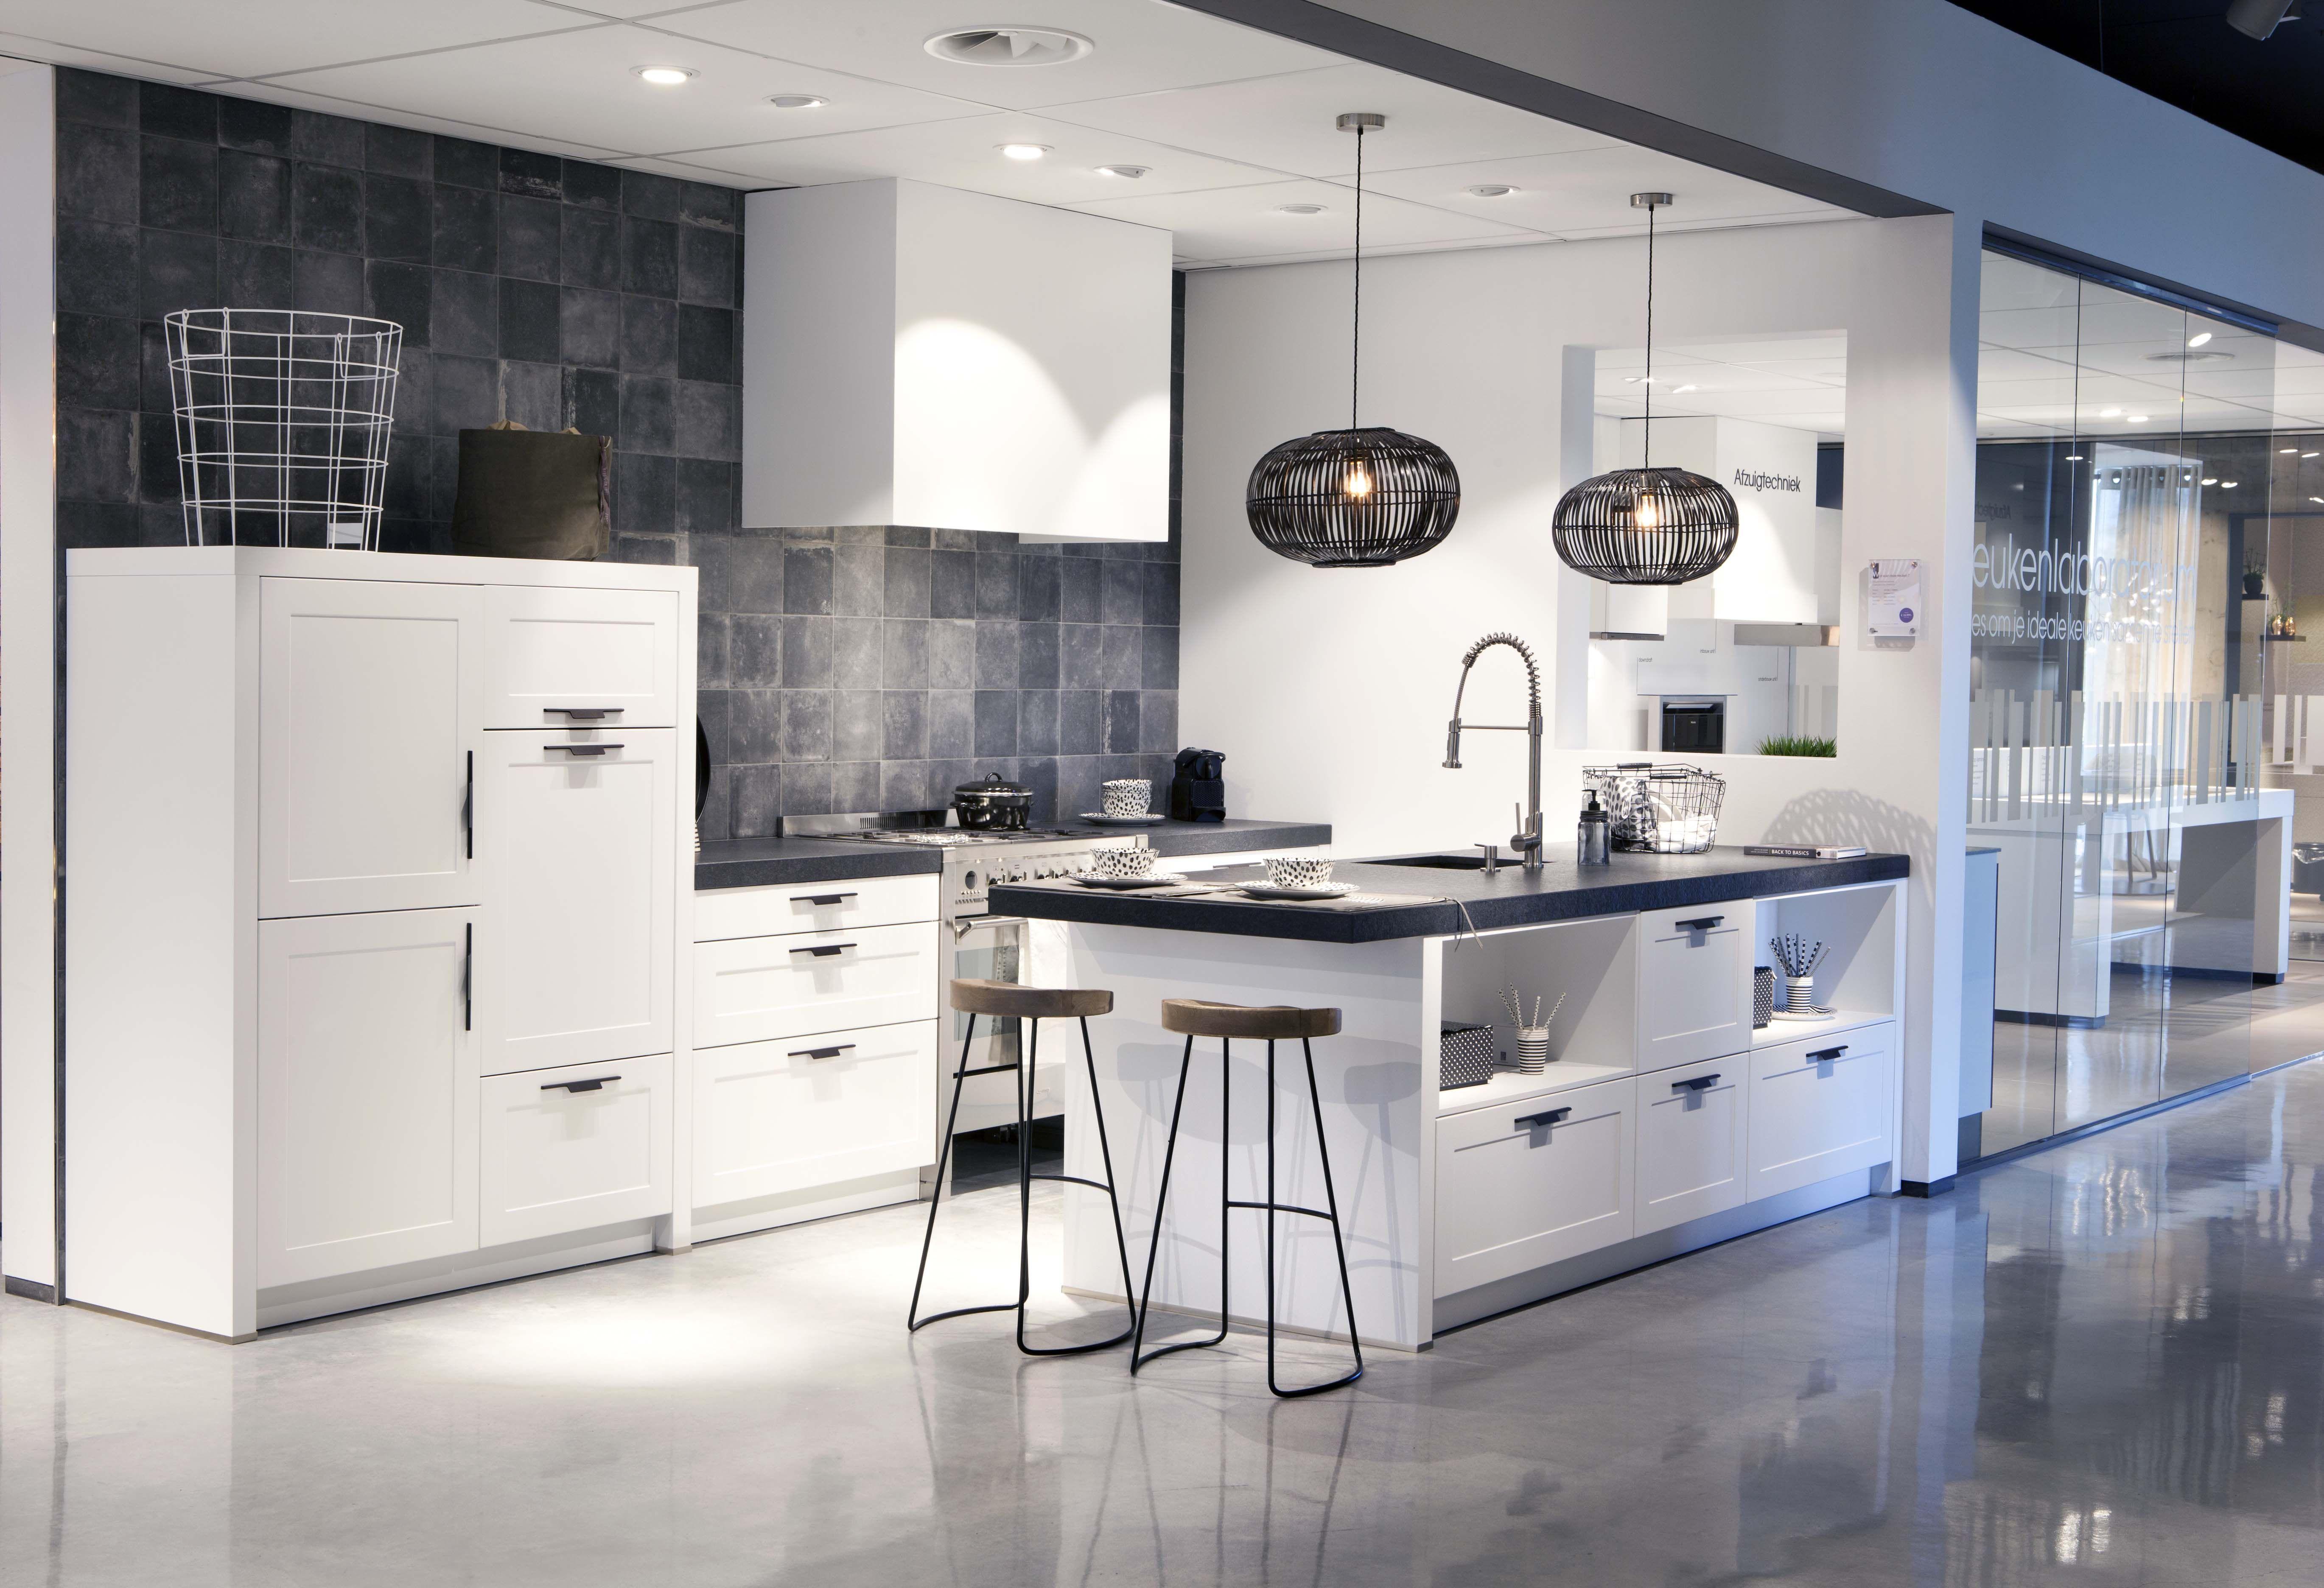 Open Keuken Inspiratie : Pin by van wanrooij keuken badkamer tegel warenhuys on